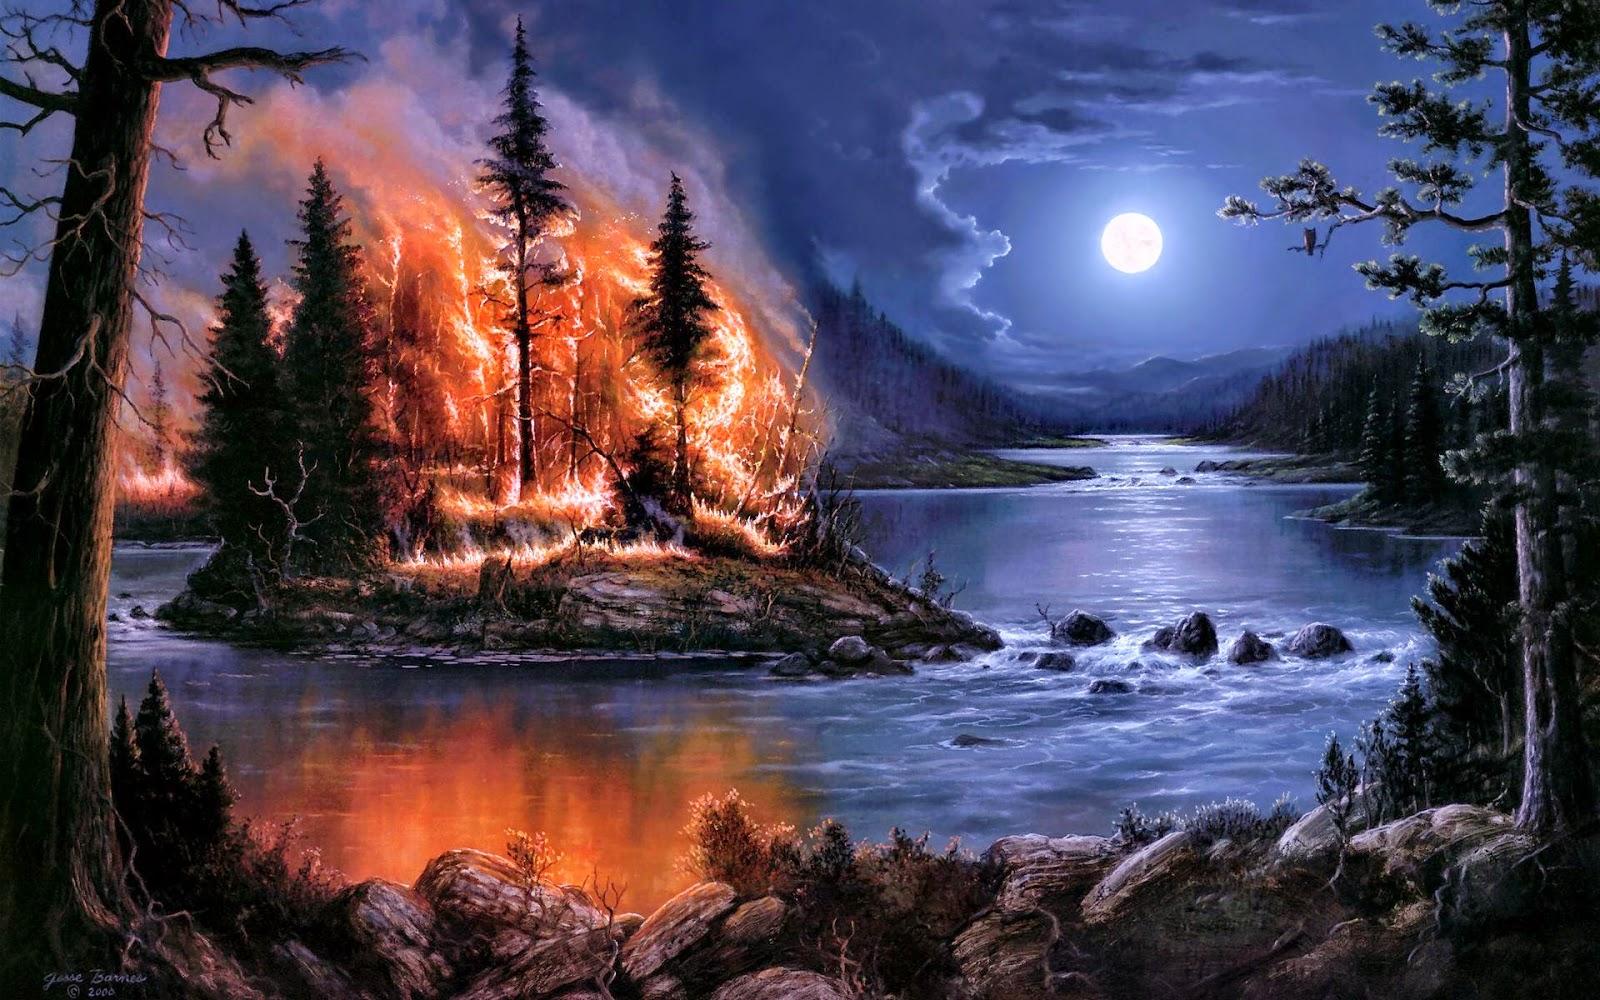 Tree-burns-at-night-near-stream-poetic-wallpaper-painting.jpg